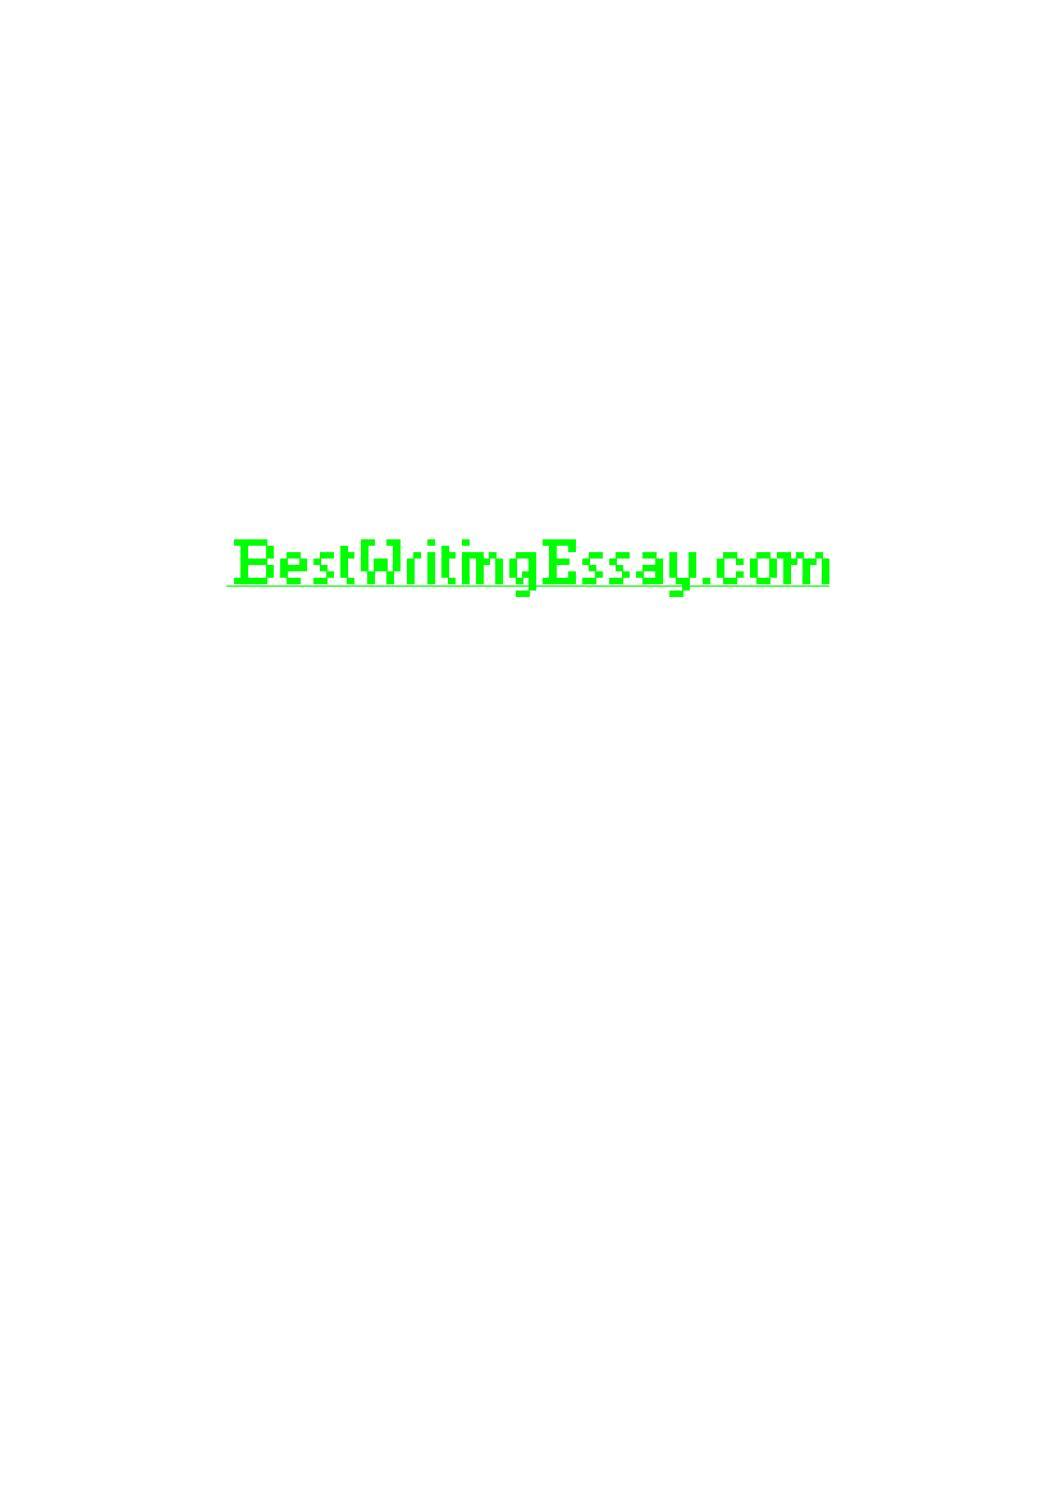 Problem solving editing service online